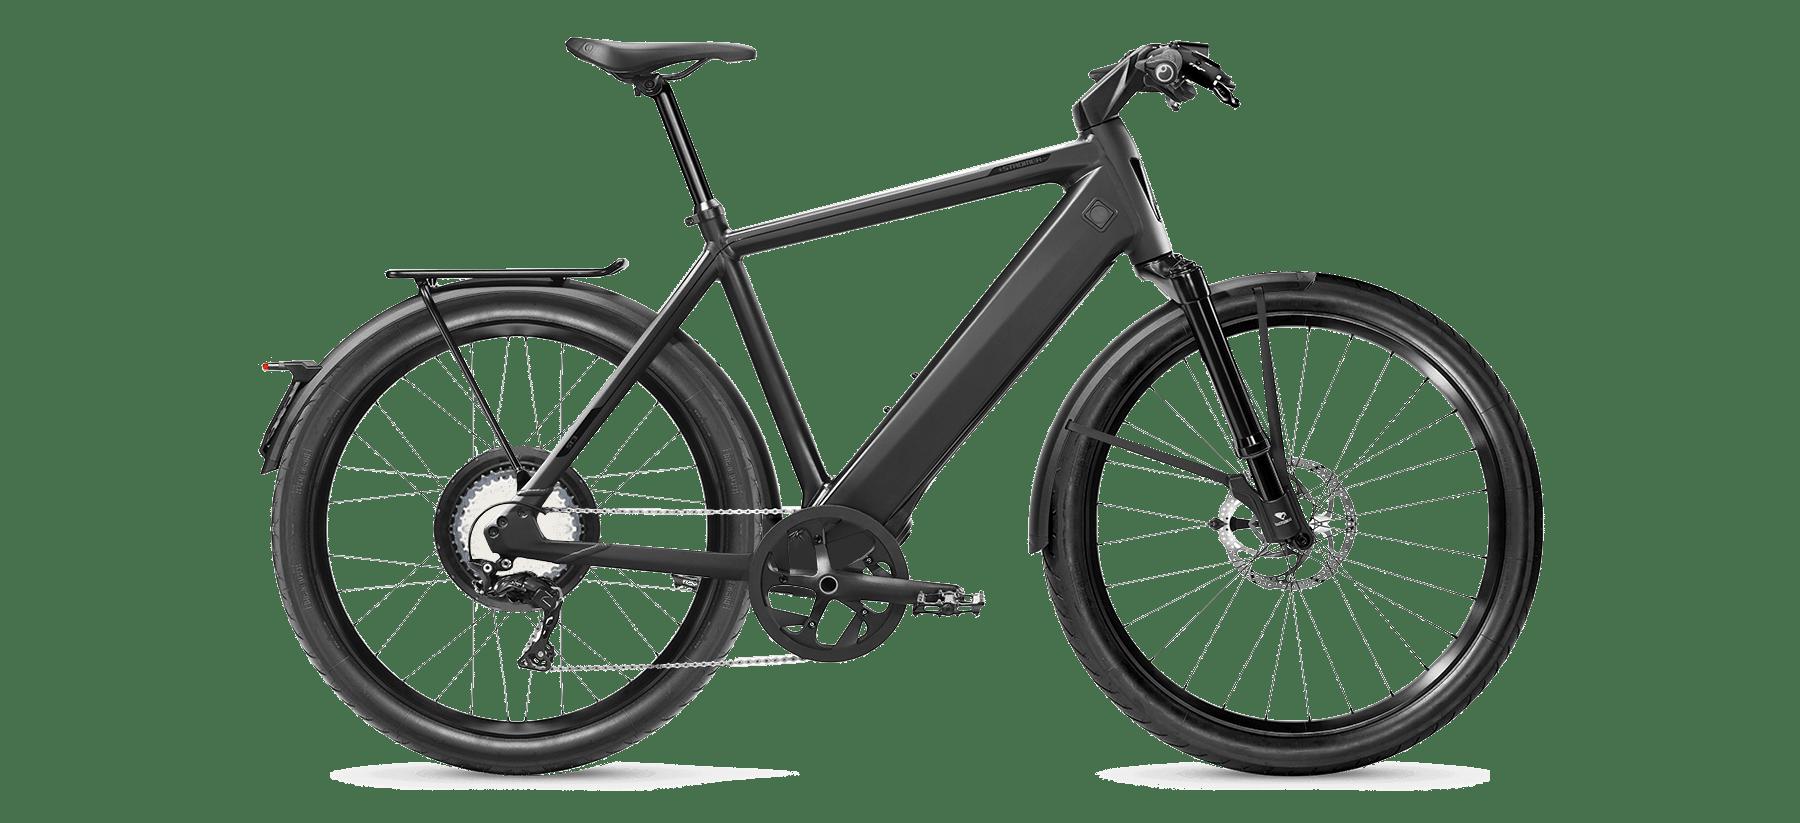 Cyclis Bikeleasing - Lease Bike